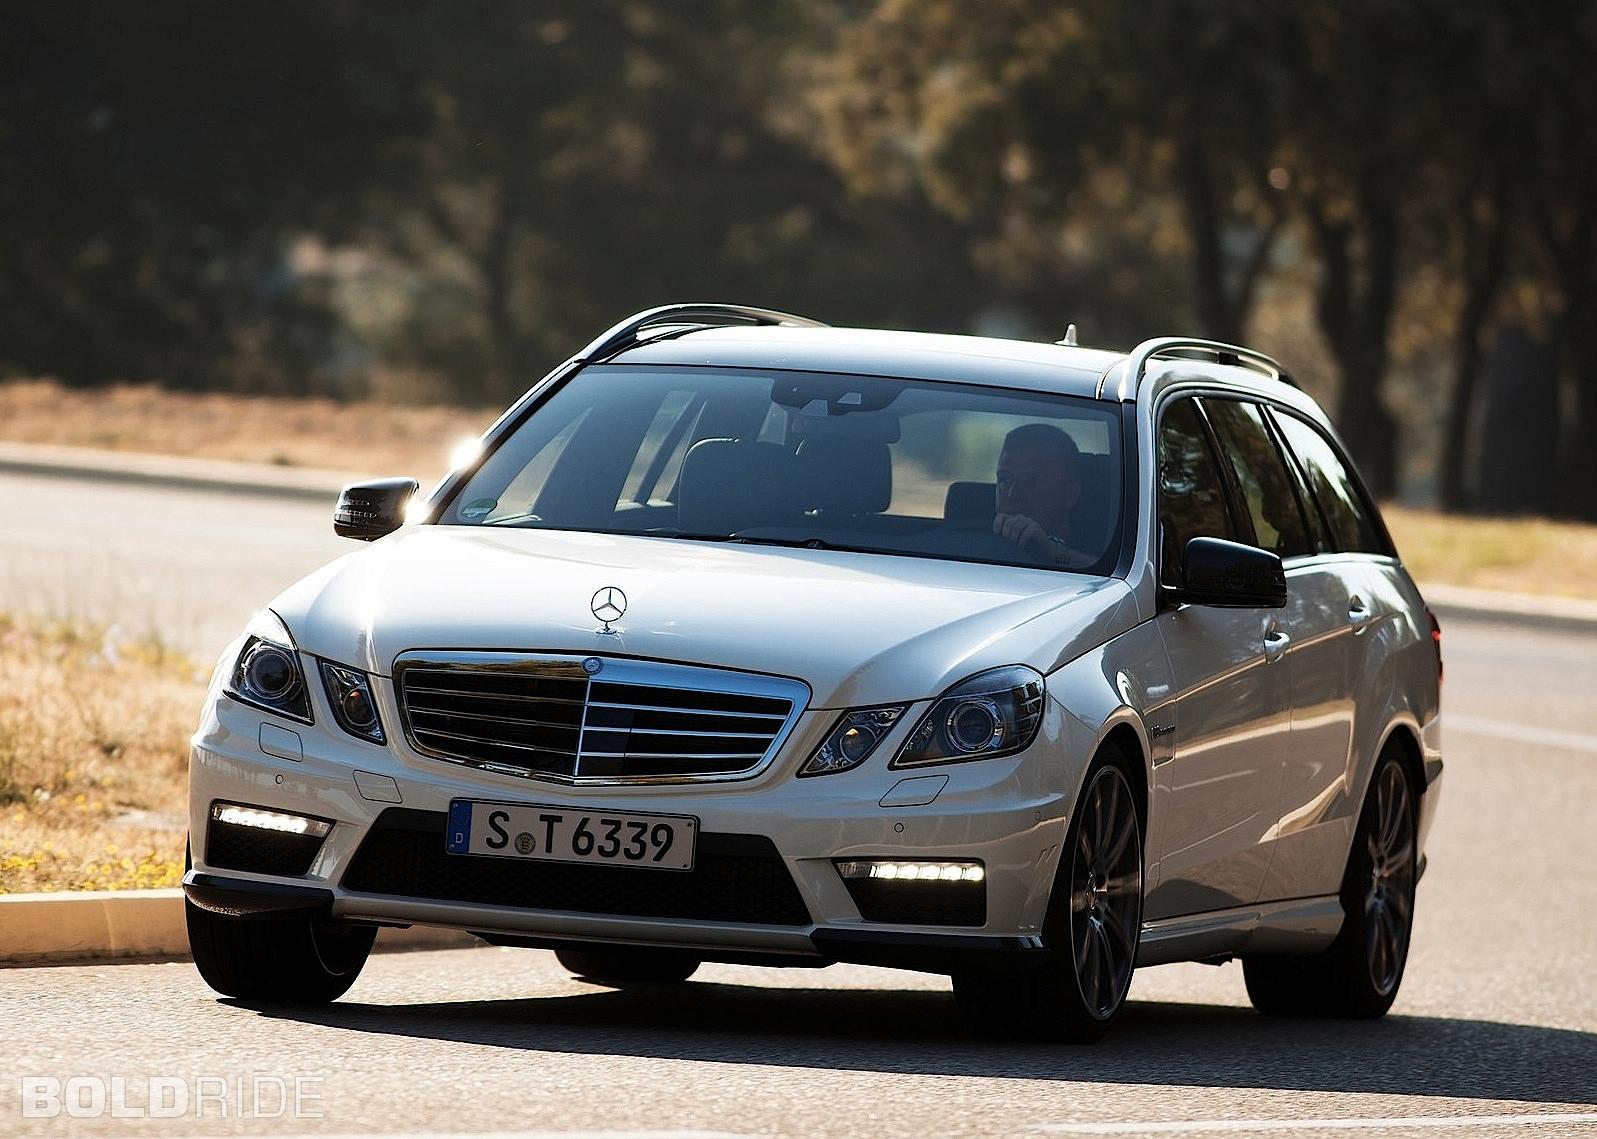 Mercedes benz e63 amg estate black series technology for Mercedes benz e series amg